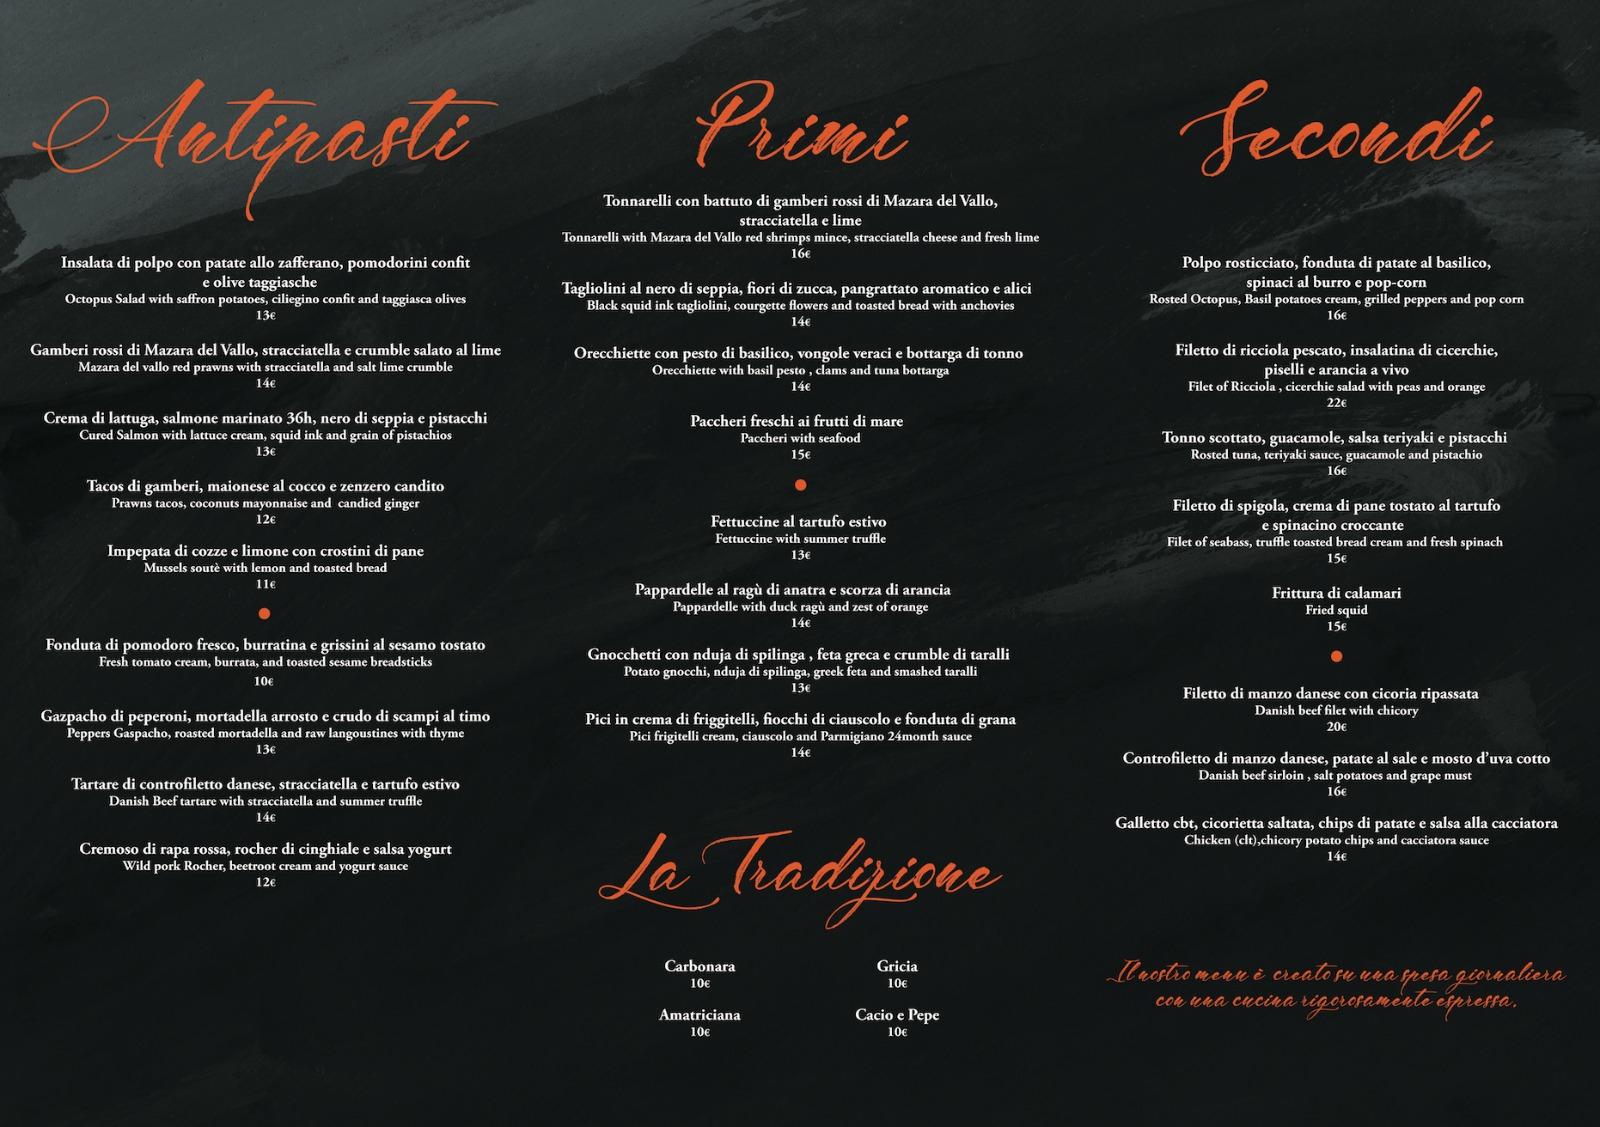 ristorante bracciano menu